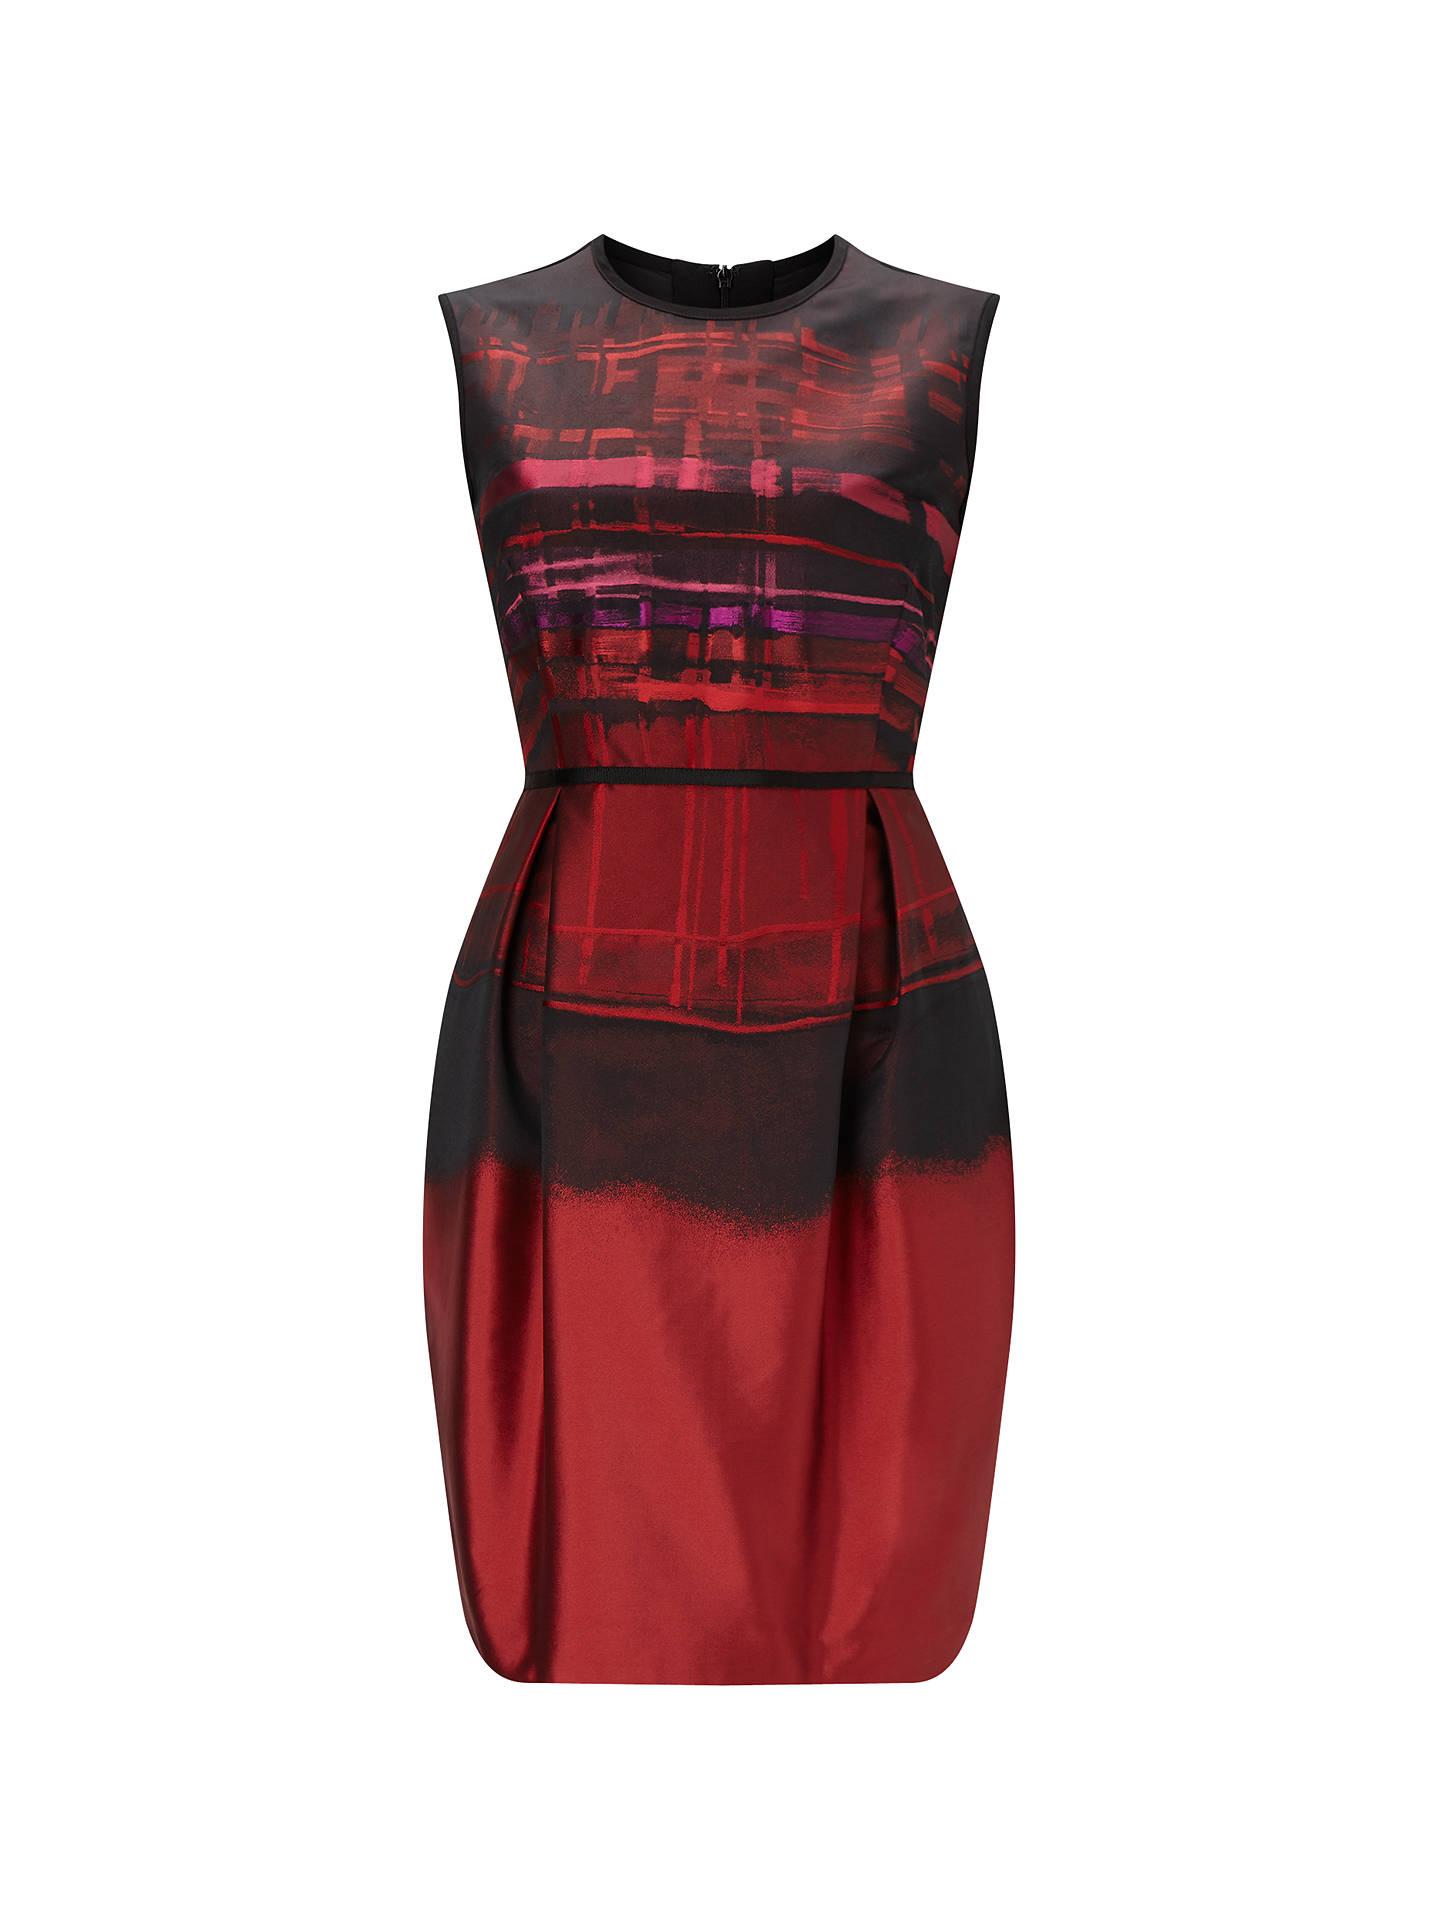 54b8bd26c69d5 Phase Eight Addison Stripe Dress, Claret at John Lewis & Partners